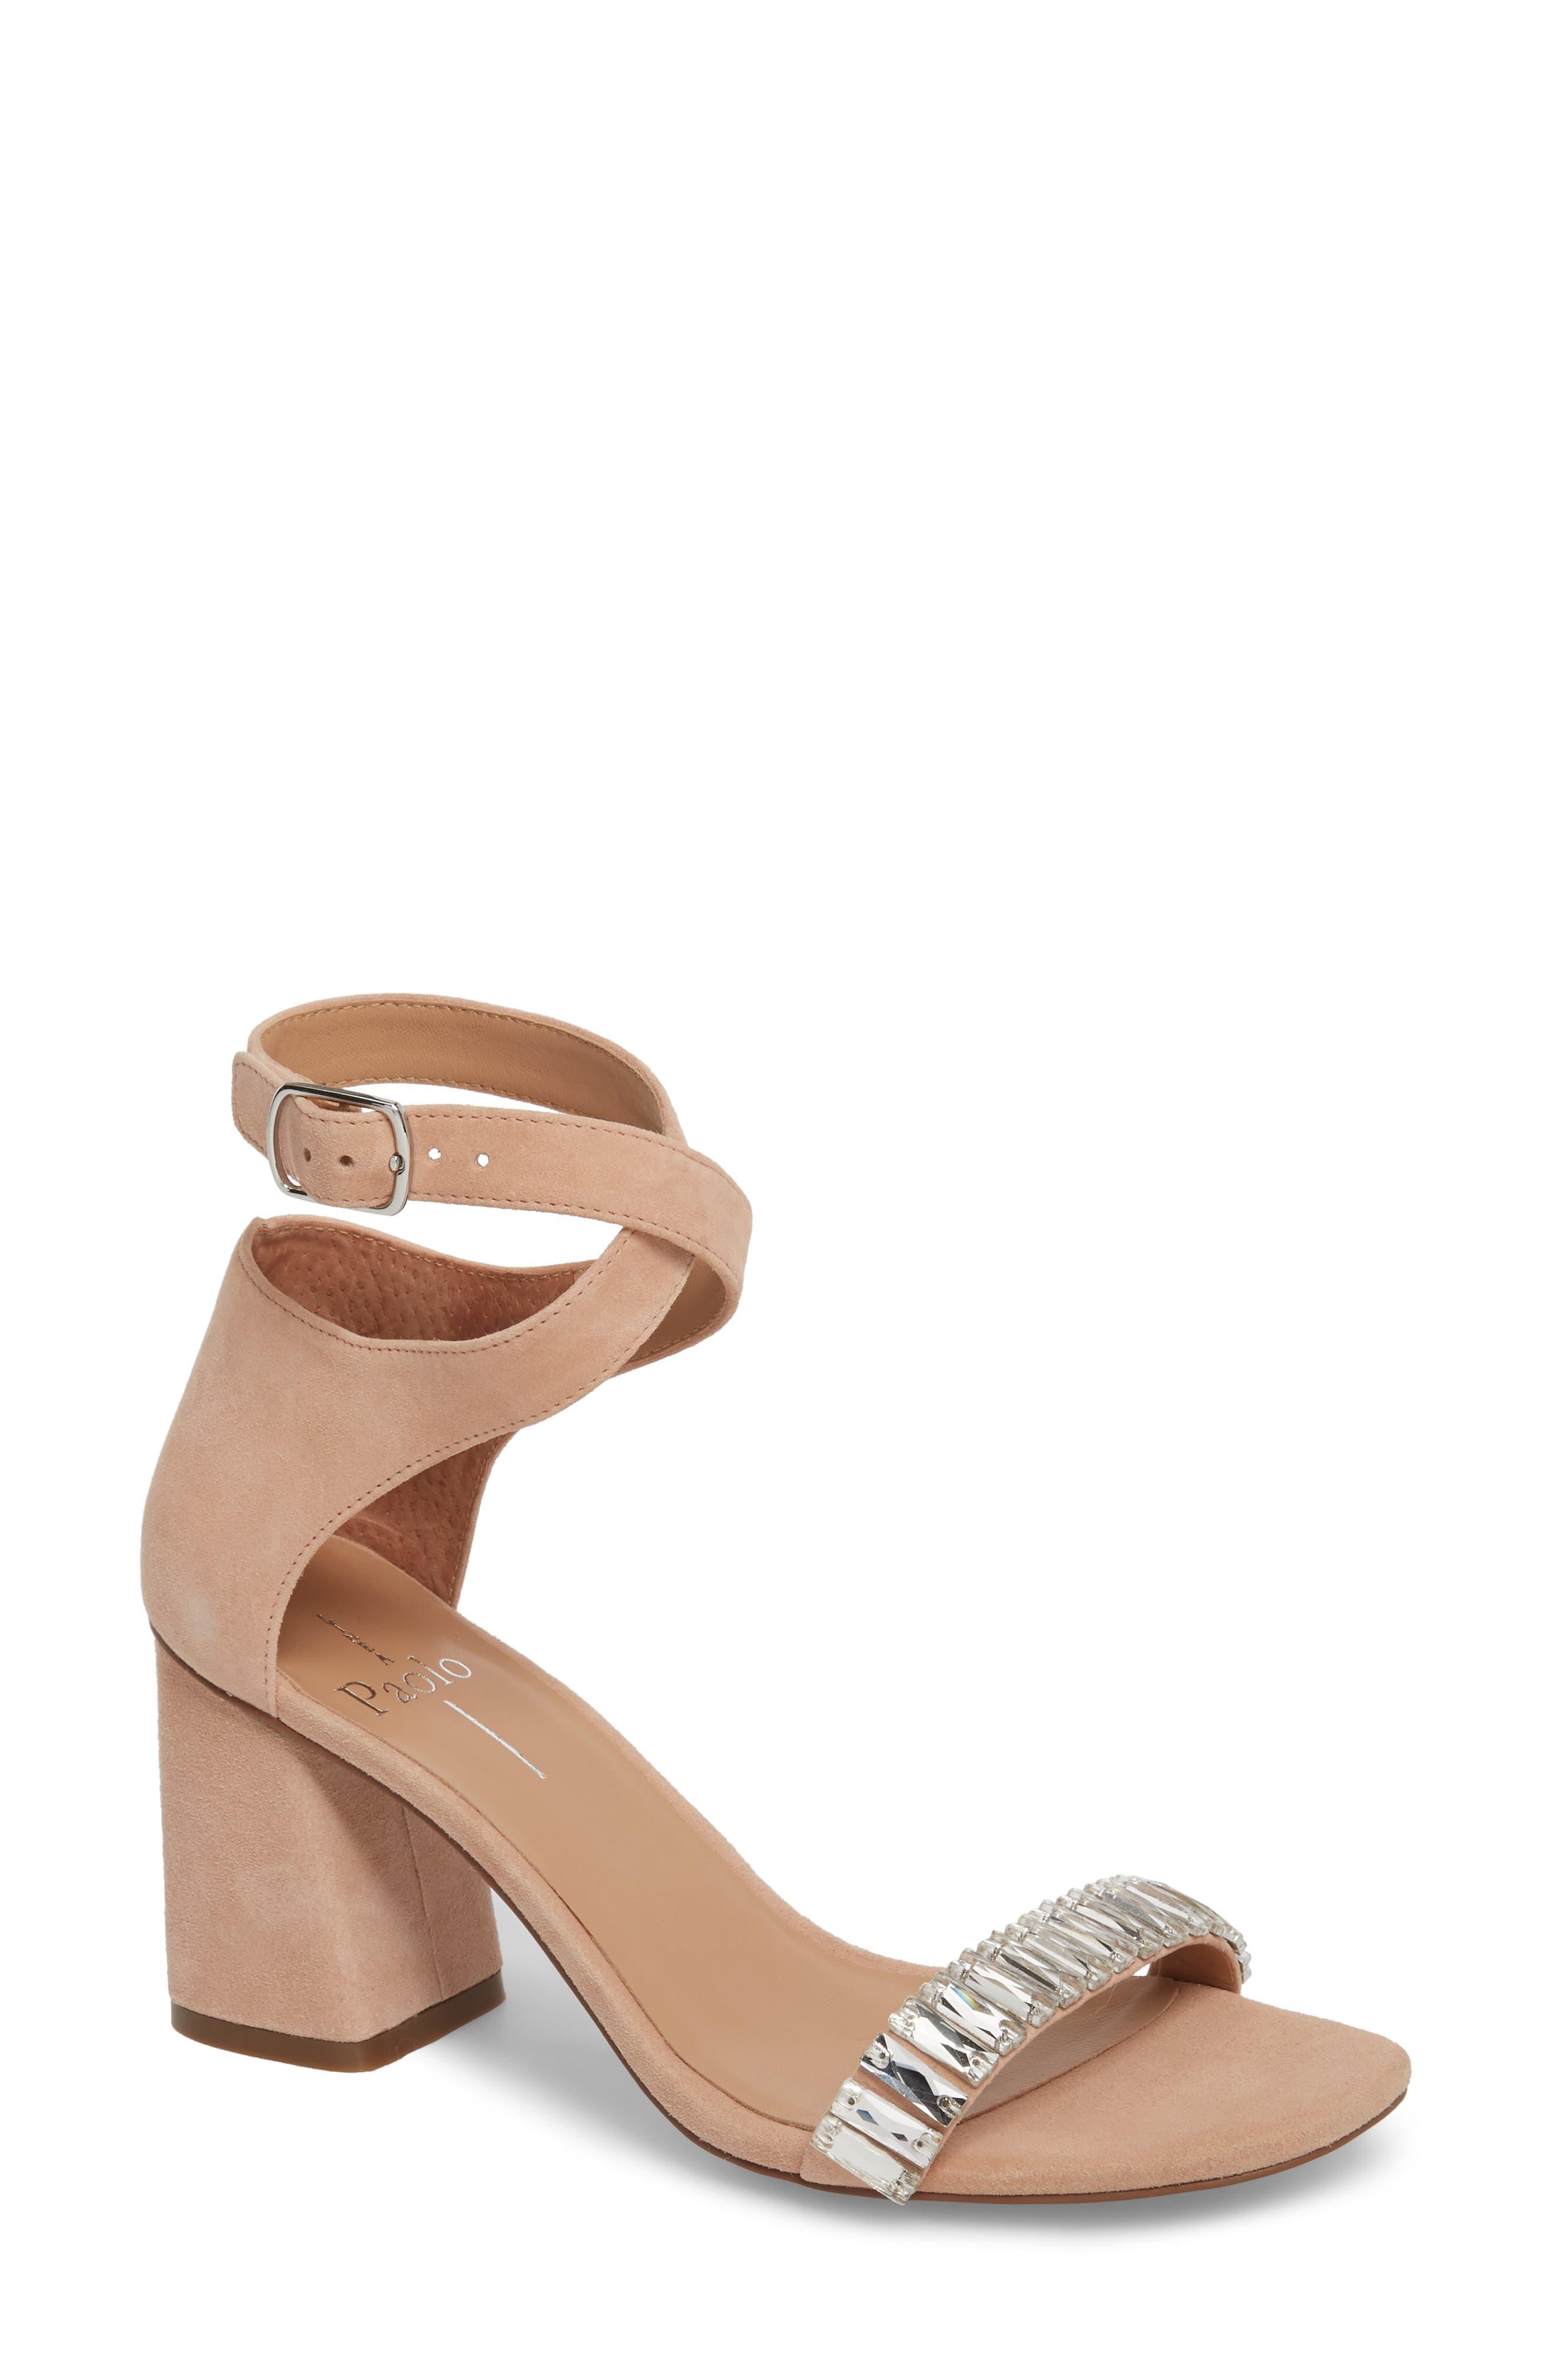 Linea Paolo Harlow Ankle Strap Sandal (Women)